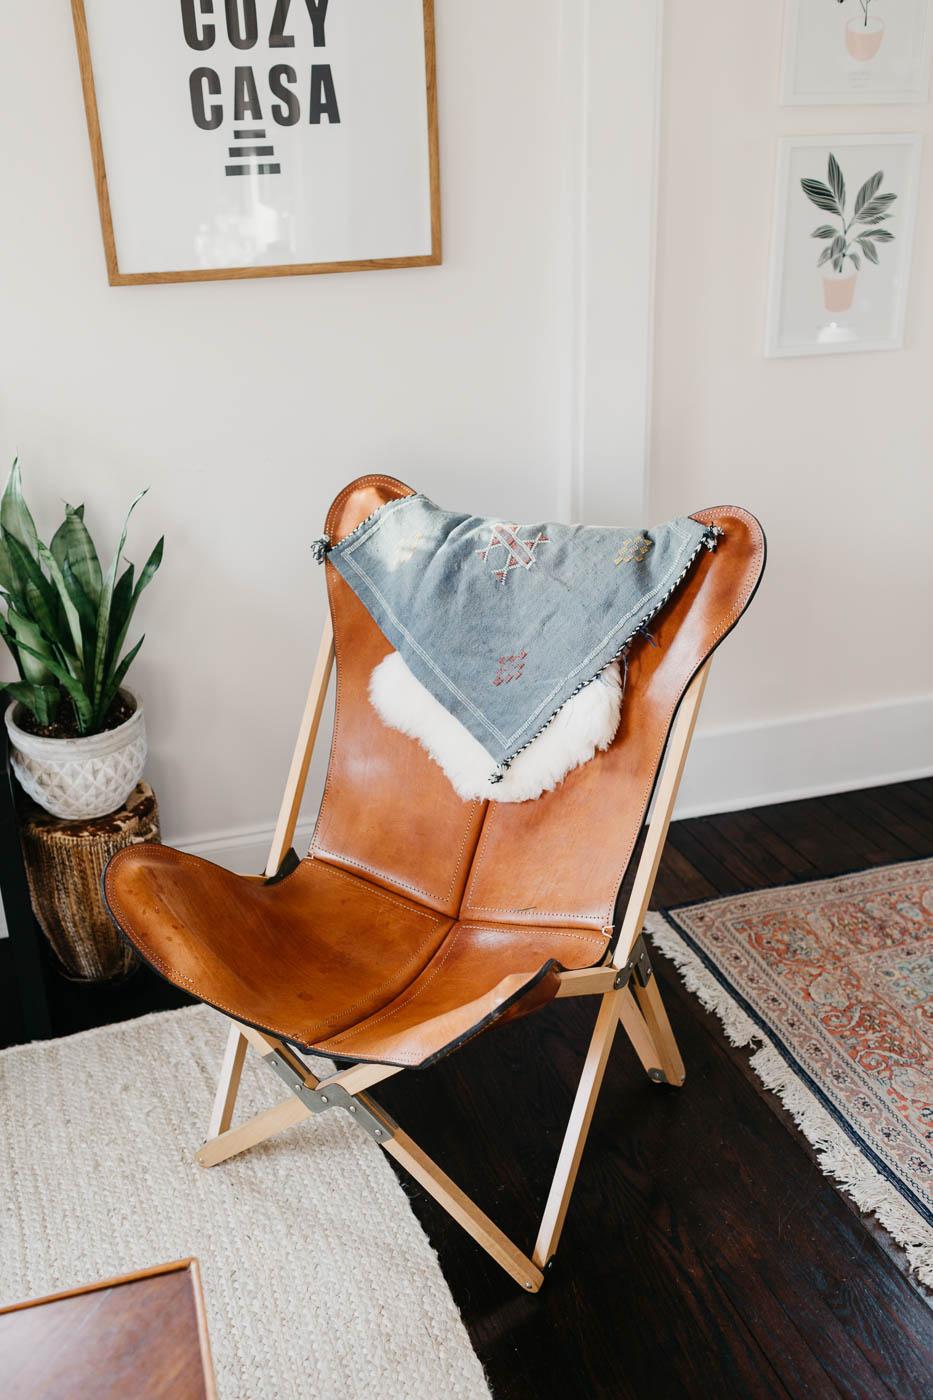 cozy-casa-nashville-tn-natural-light-studio-photography-ideas-lifestyle-photographer-photography-23.jpg